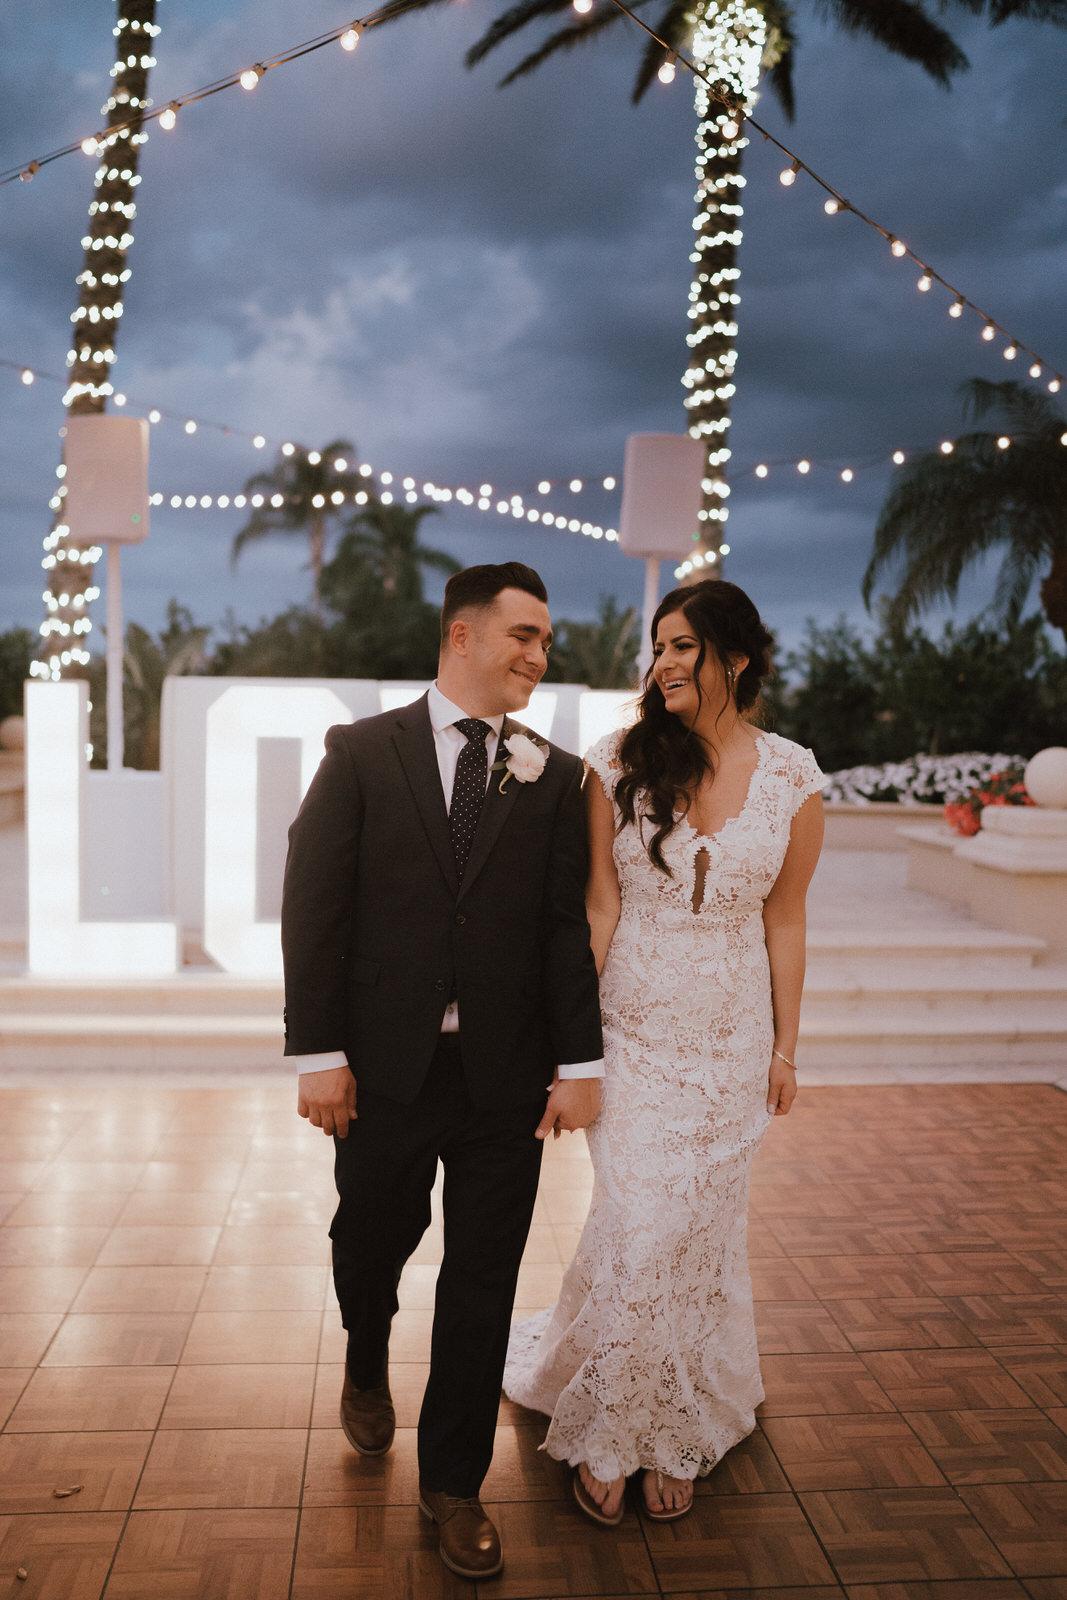 Club at the Strand Wedding- Naples Florida Wedding Photographer- Michelle Gonzalez Photography- Desiree and Bryan-990.JPG